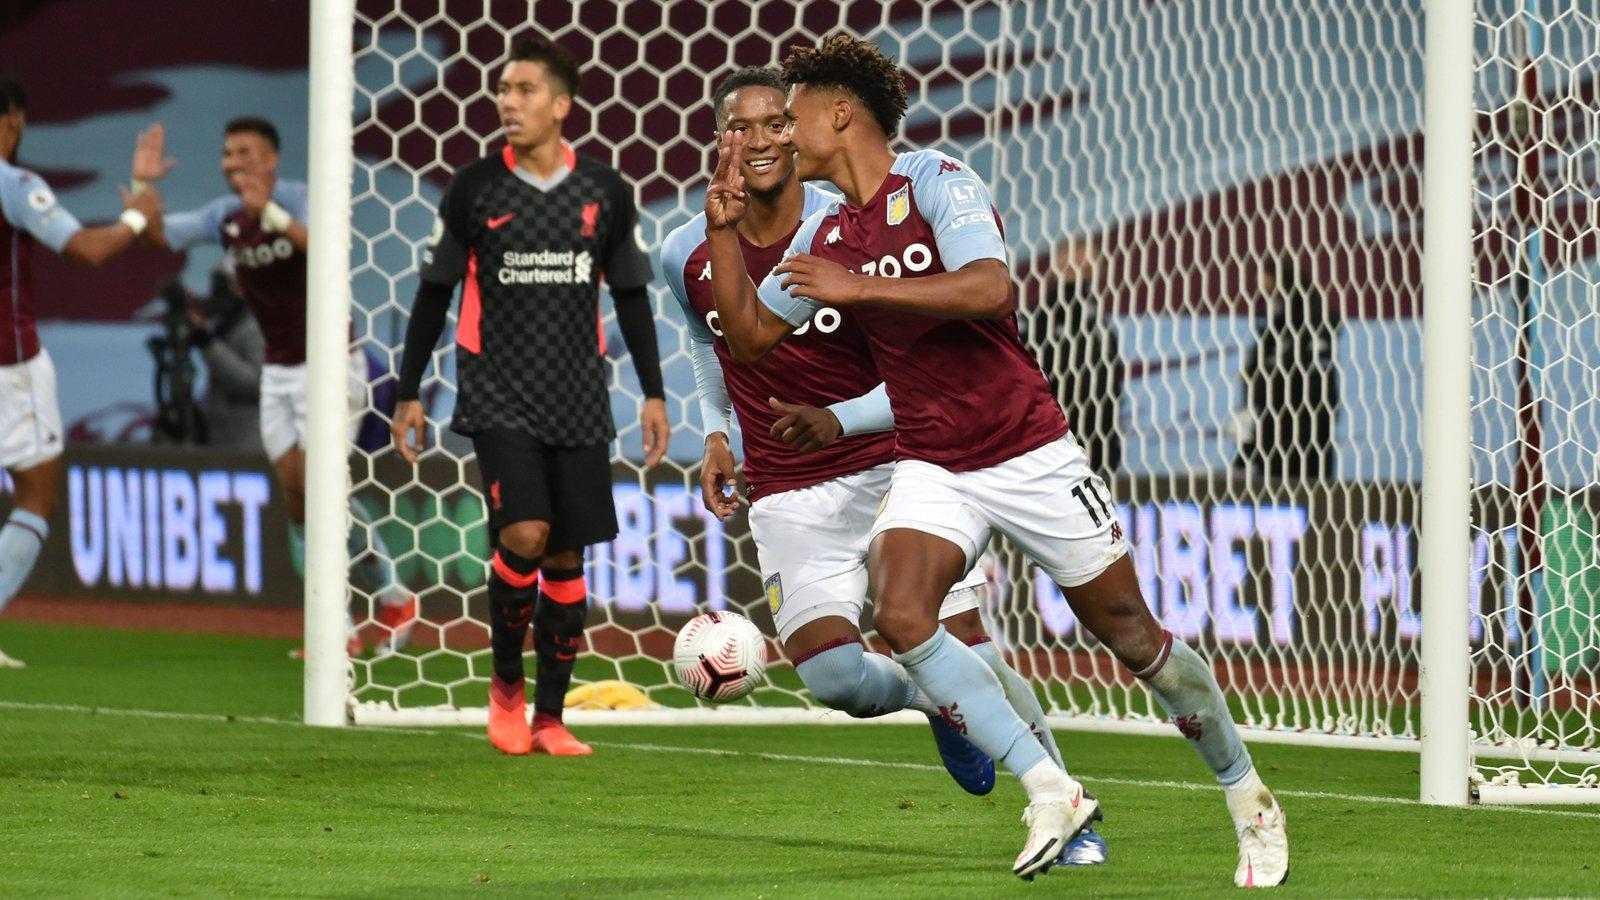 Aston Villa S Magnificent Seven Tears Liverpool Apart